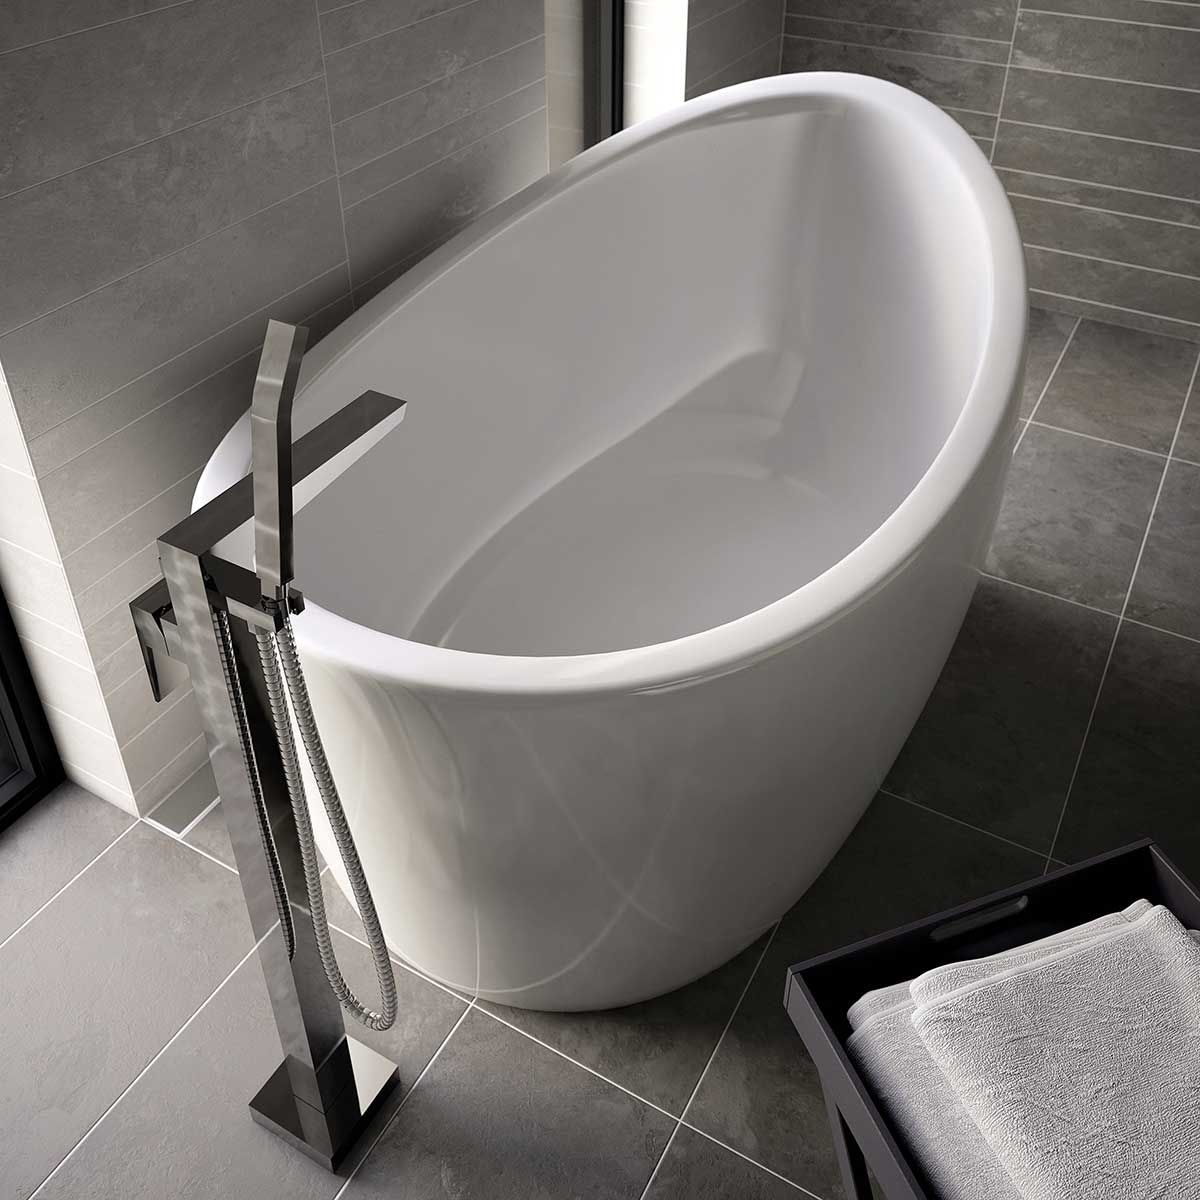 Bristan Sail Bath Shower Mixer Tap, Floor Mounted, Chrome